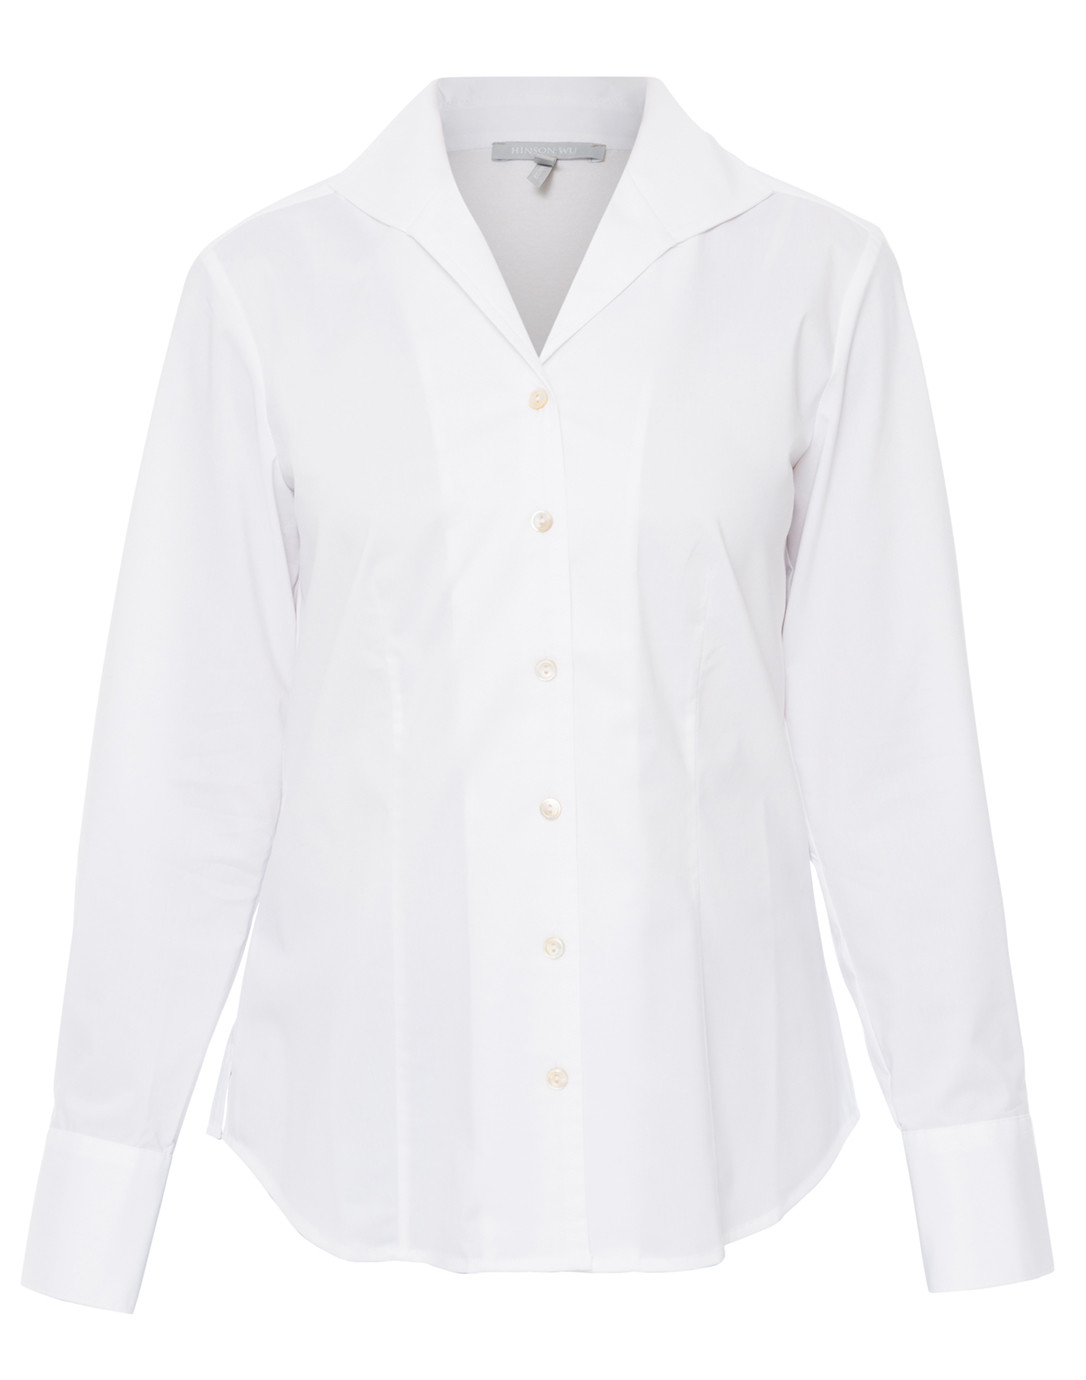 Donna White Button Down Stretch Cotton Shirt Hinson Wu Halsbrook